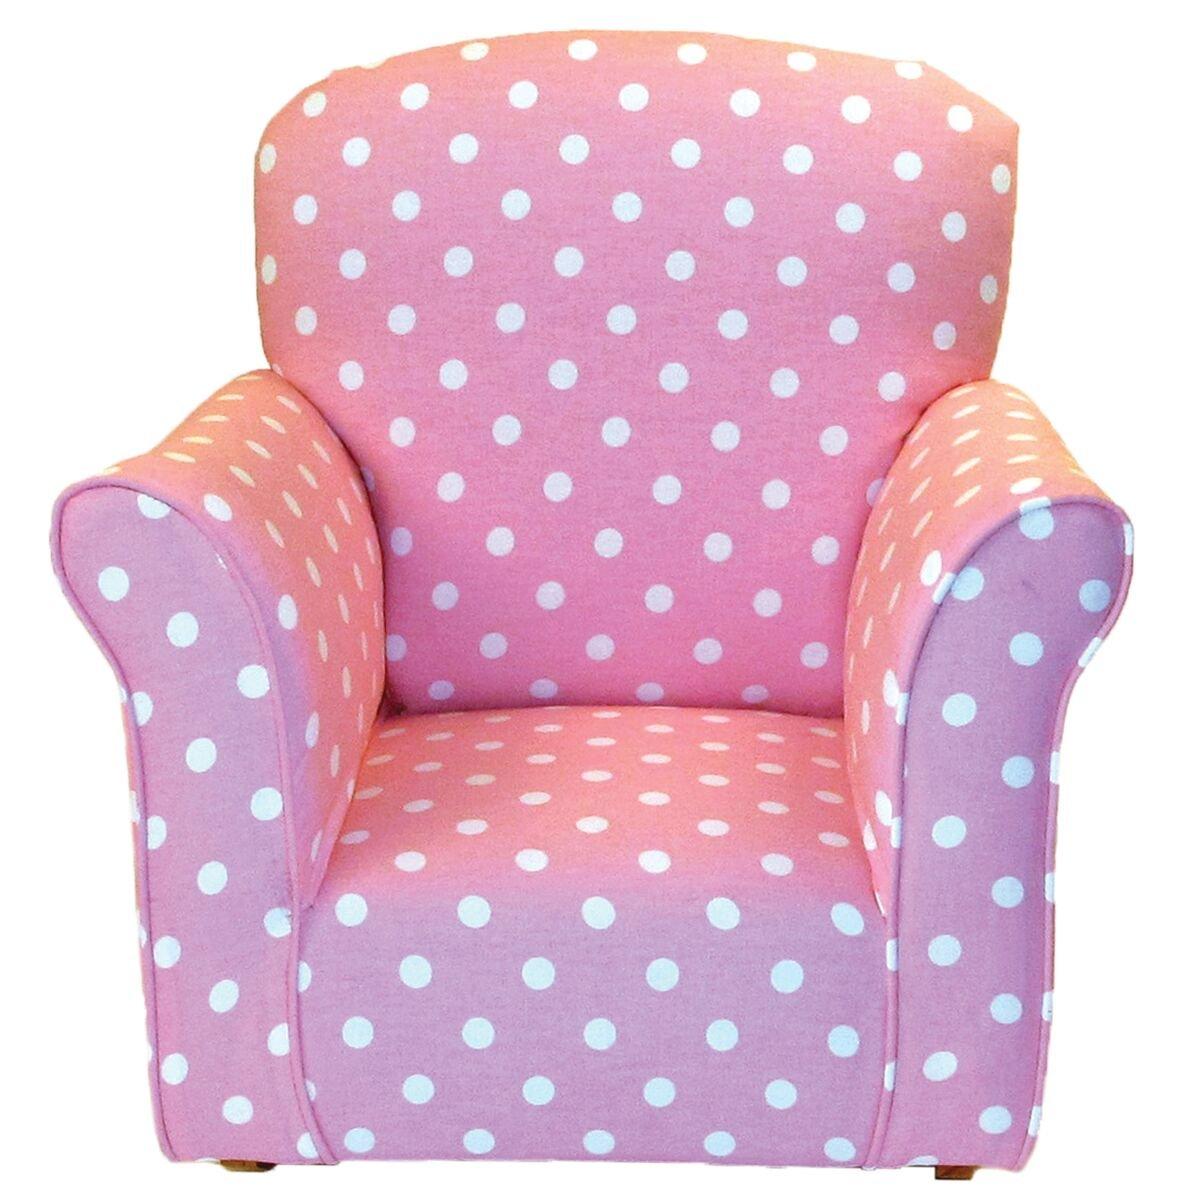 Brighton Home Furniture Pink with White Polka Dots Toddler Rocker - Cotton Rocking Chair